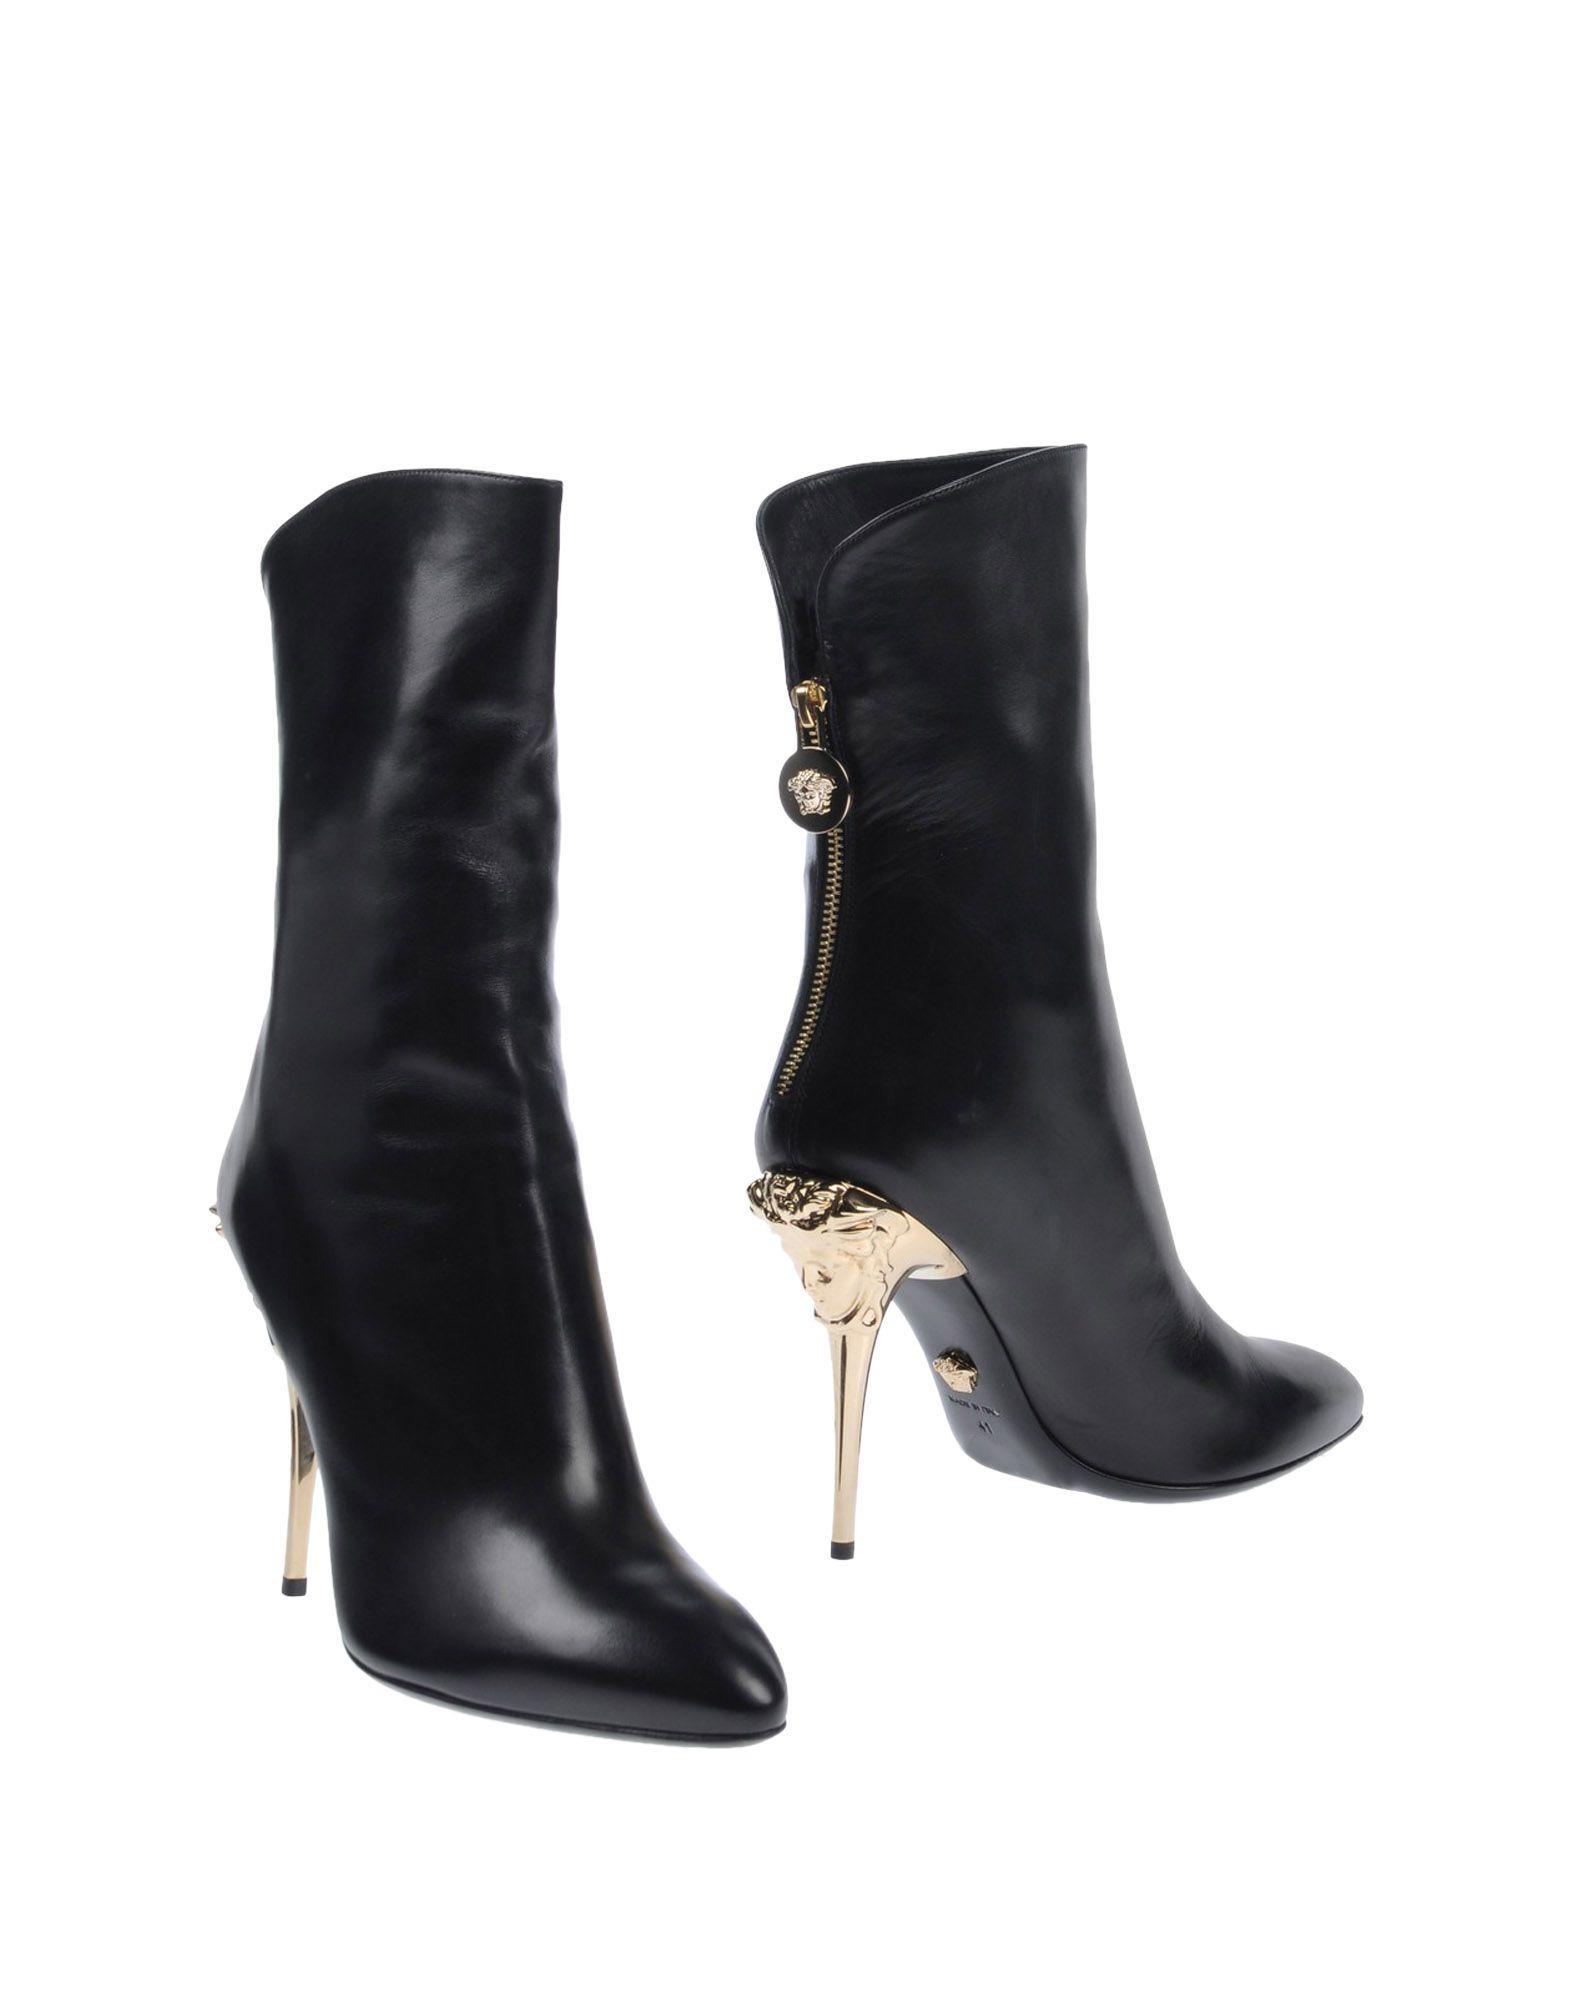 Versace Stiefelette Damen gut  11486985QSGünstige gut Damen aussehende Schuhe 55be8b